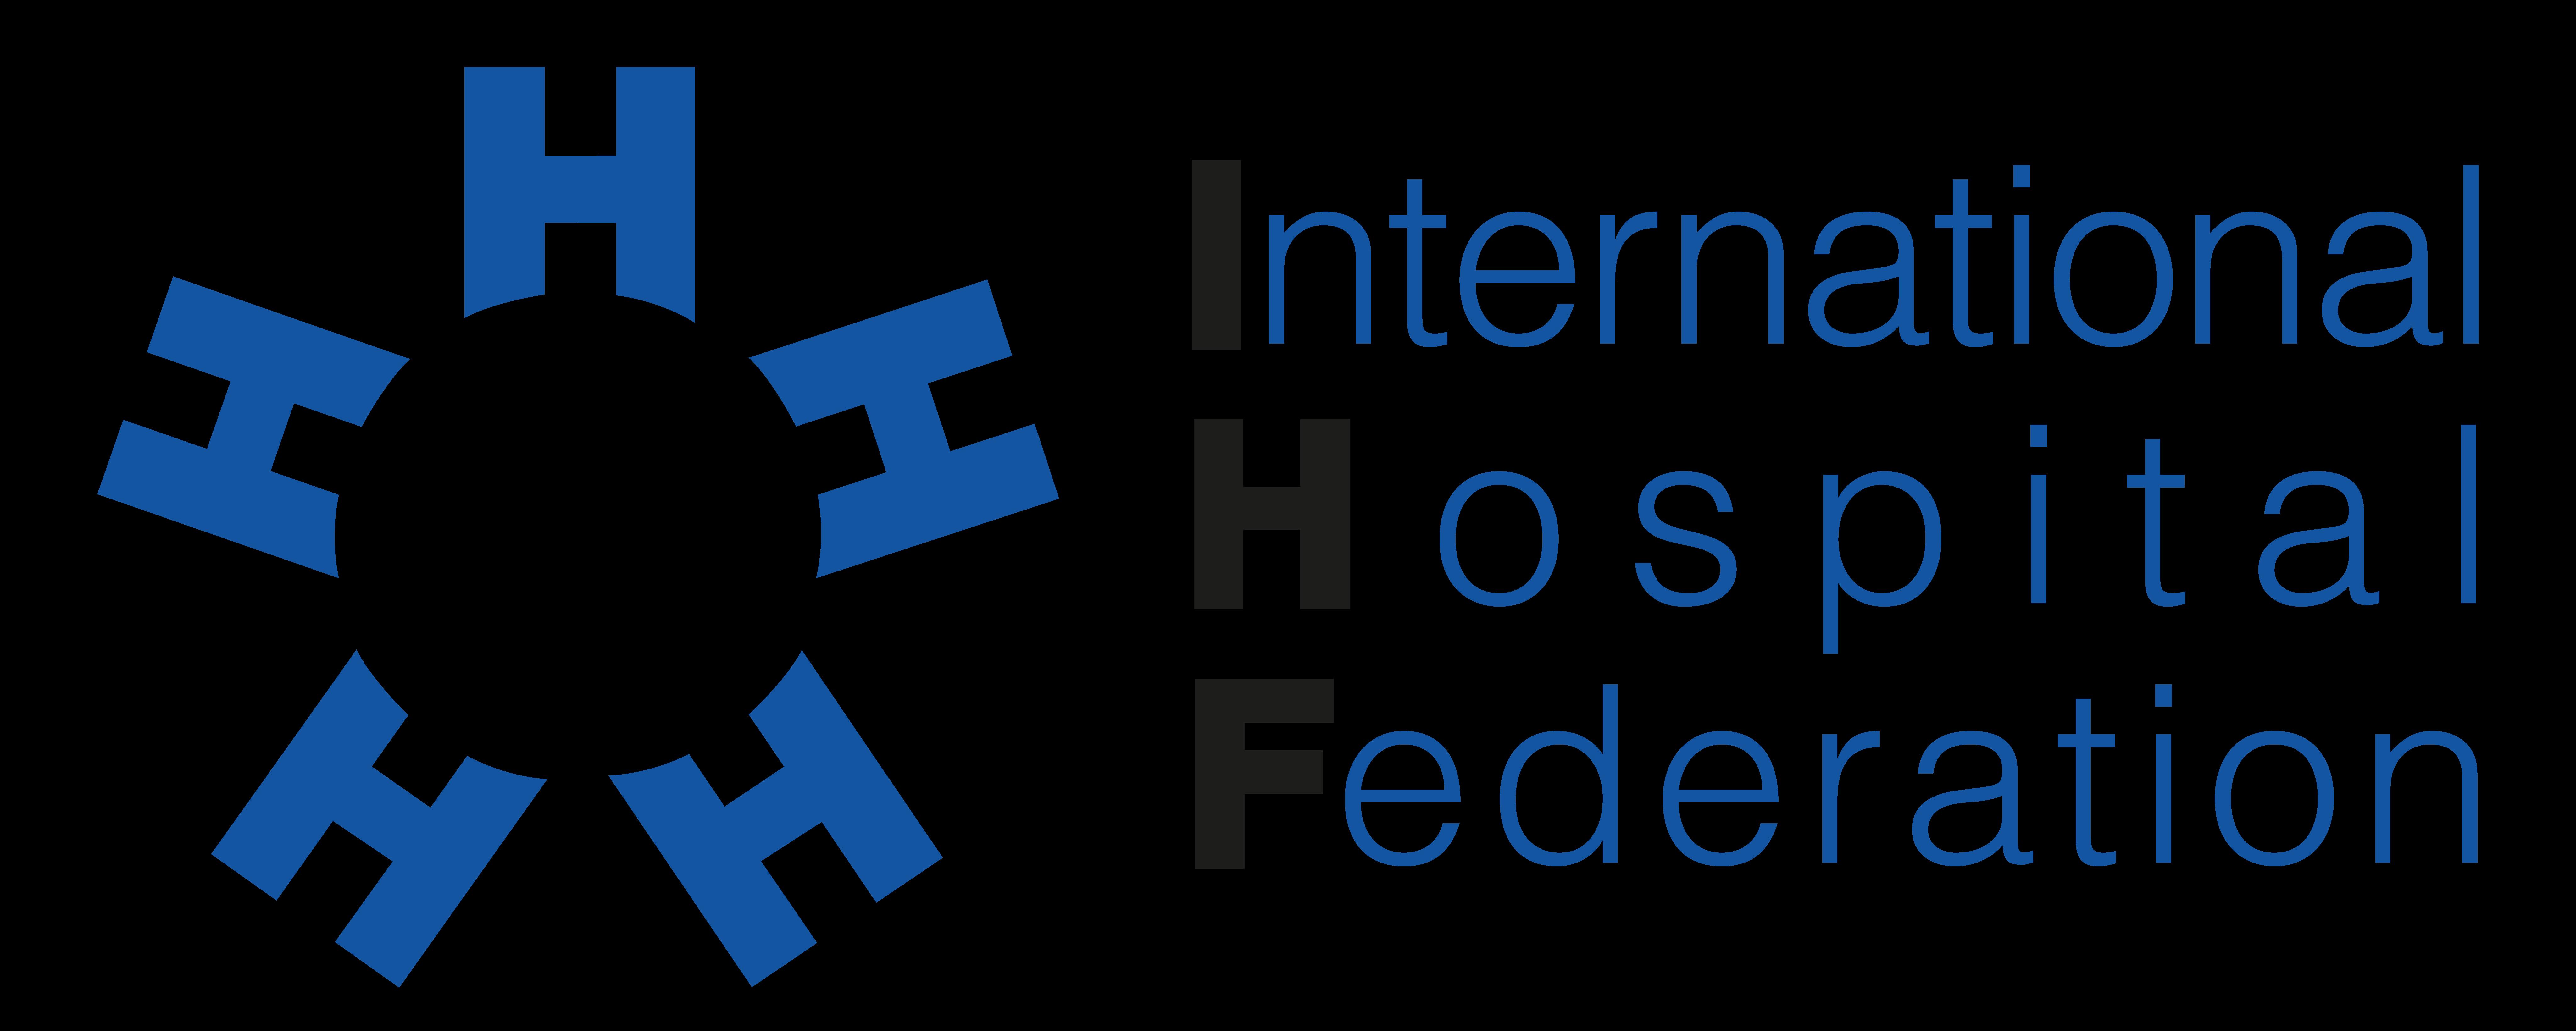 IHF-Logo-1-S.png